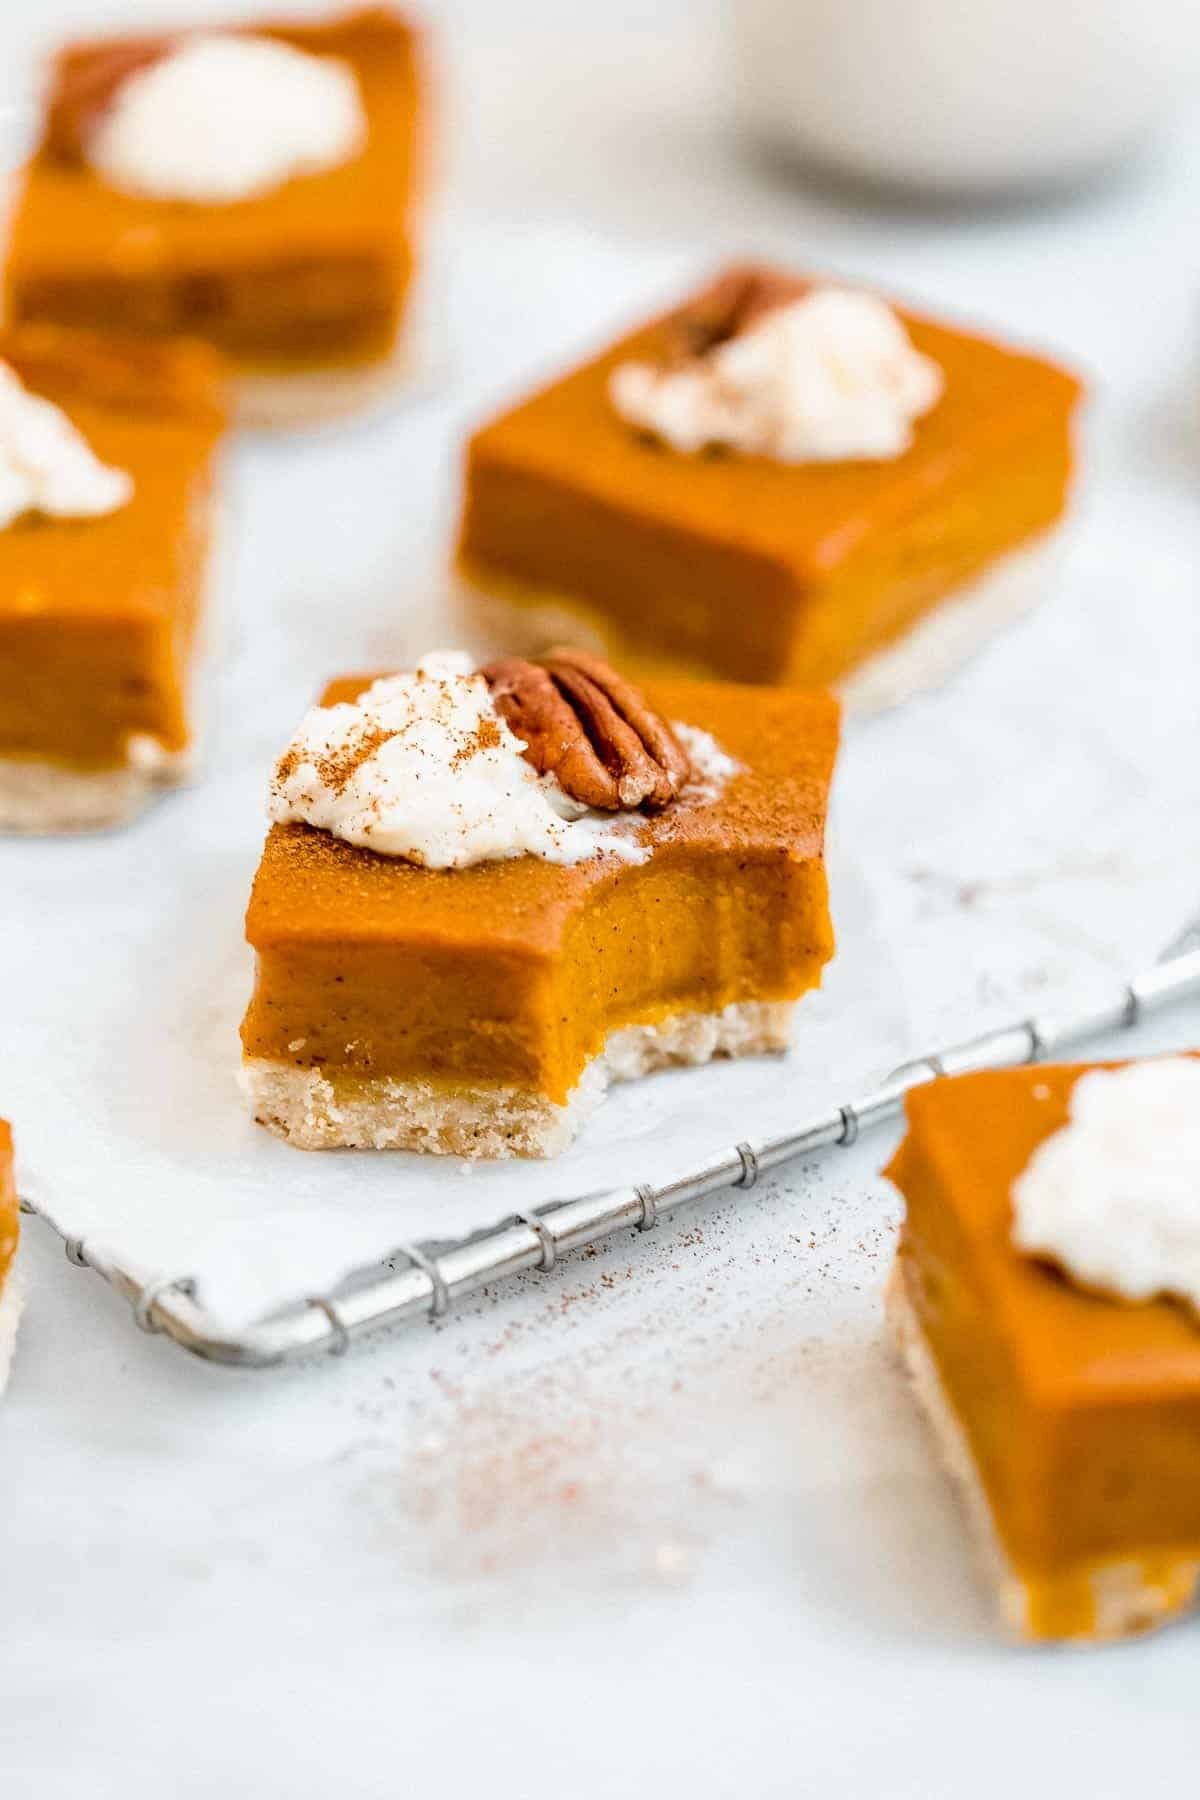 vegan sweet potato pie bars with milk in the back.